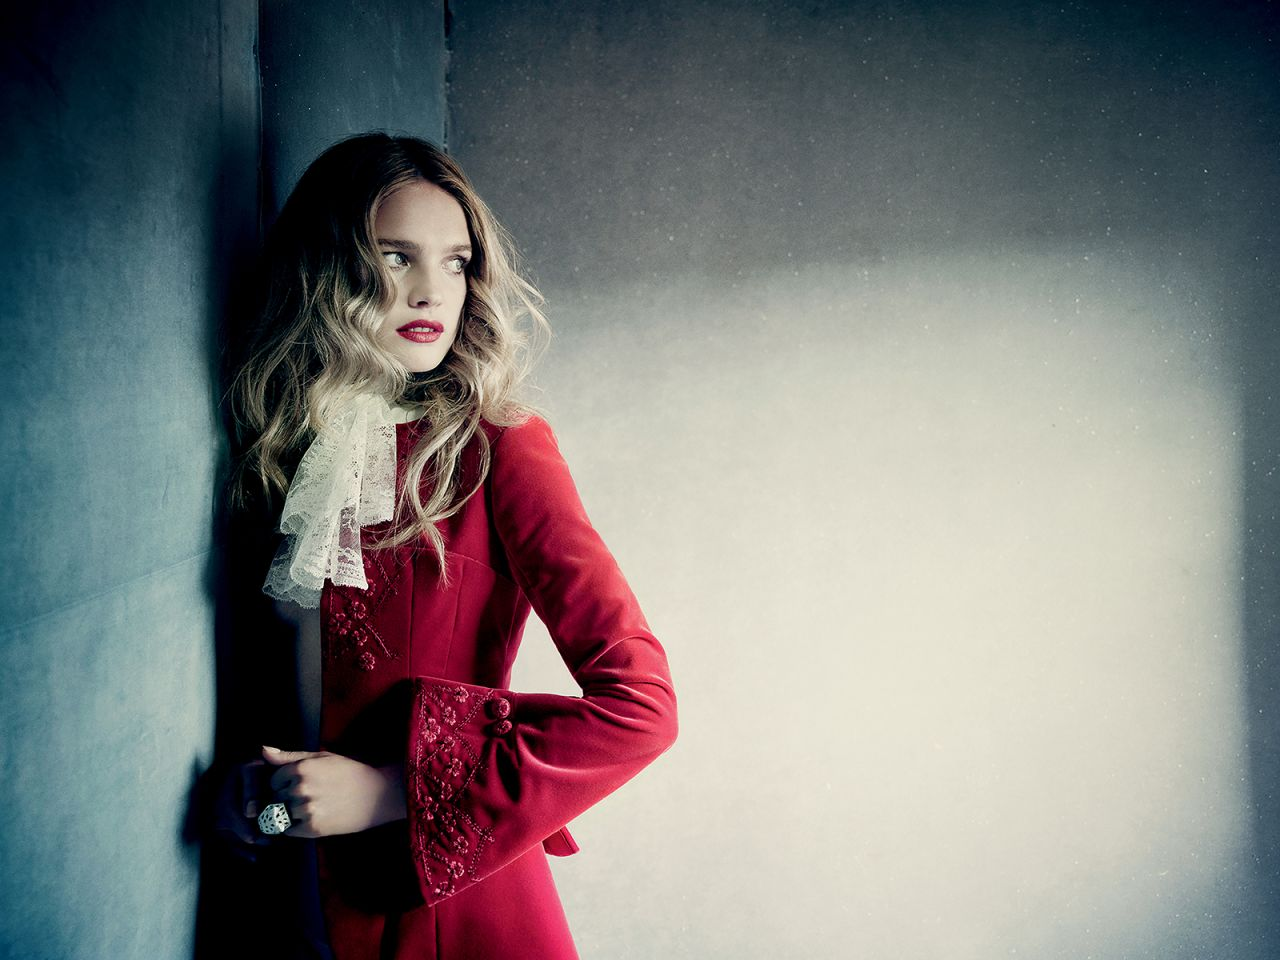 Natalia vodianova photoshoot for vogue magazine russia for Haute couture photoshoot